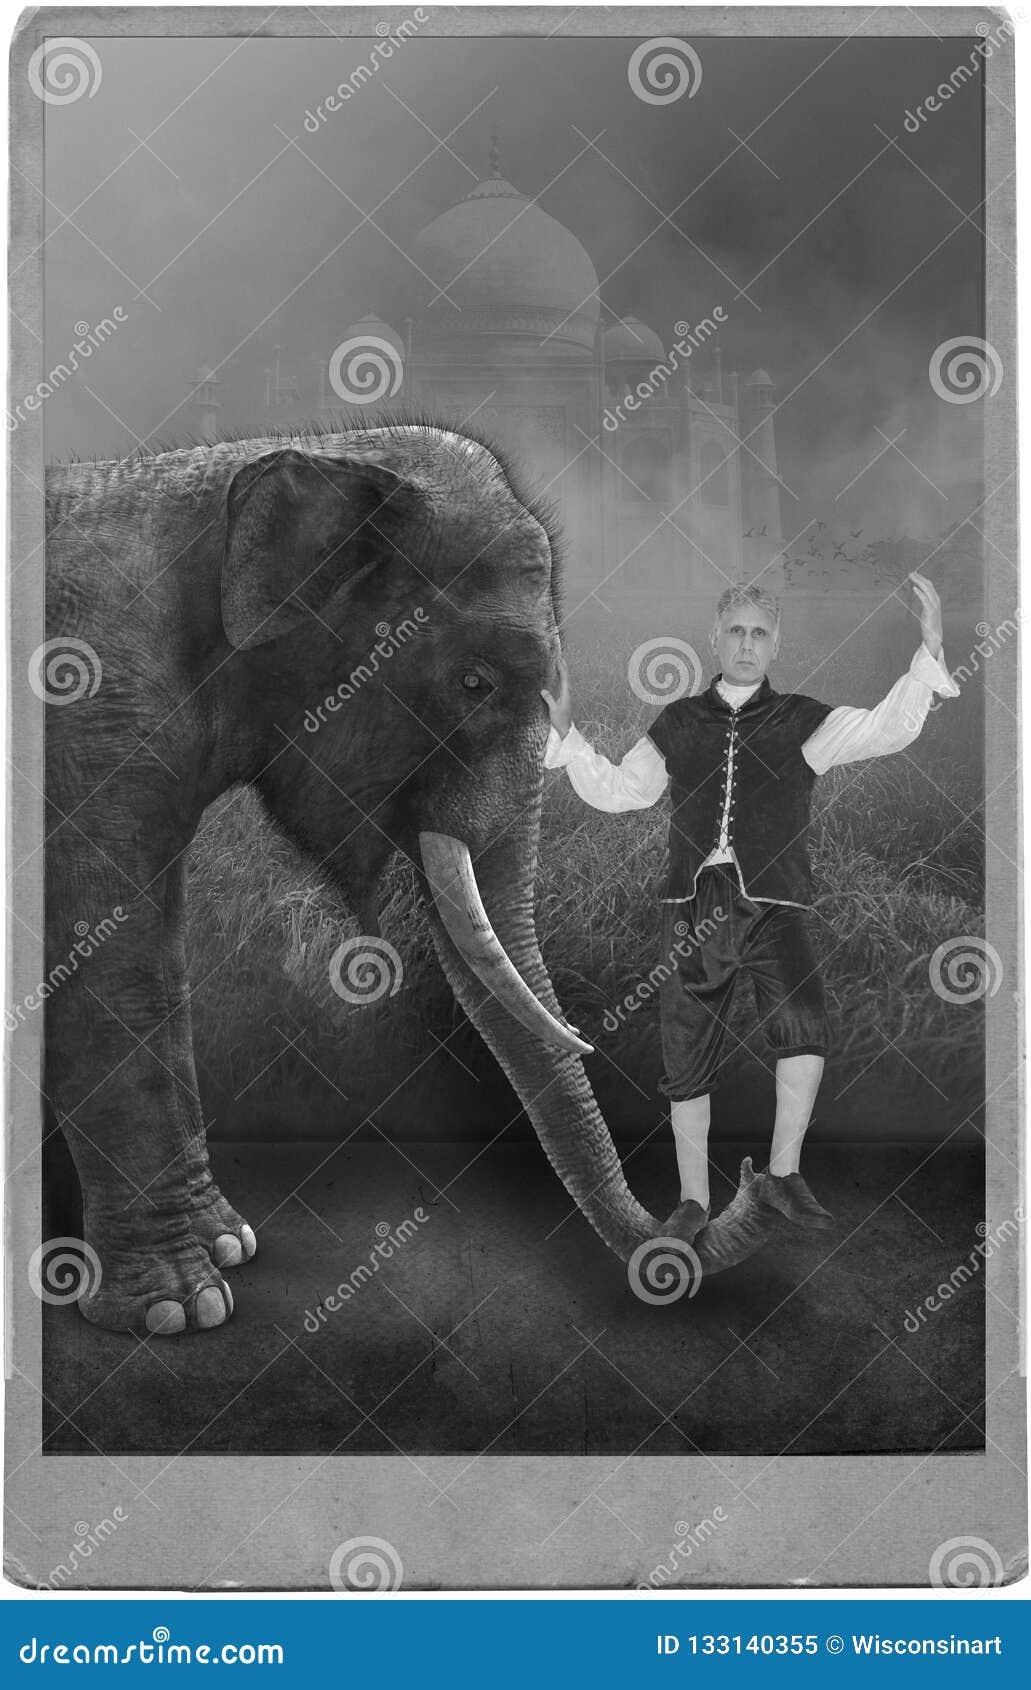 Executor de circo do vintage, carnaval, elefante